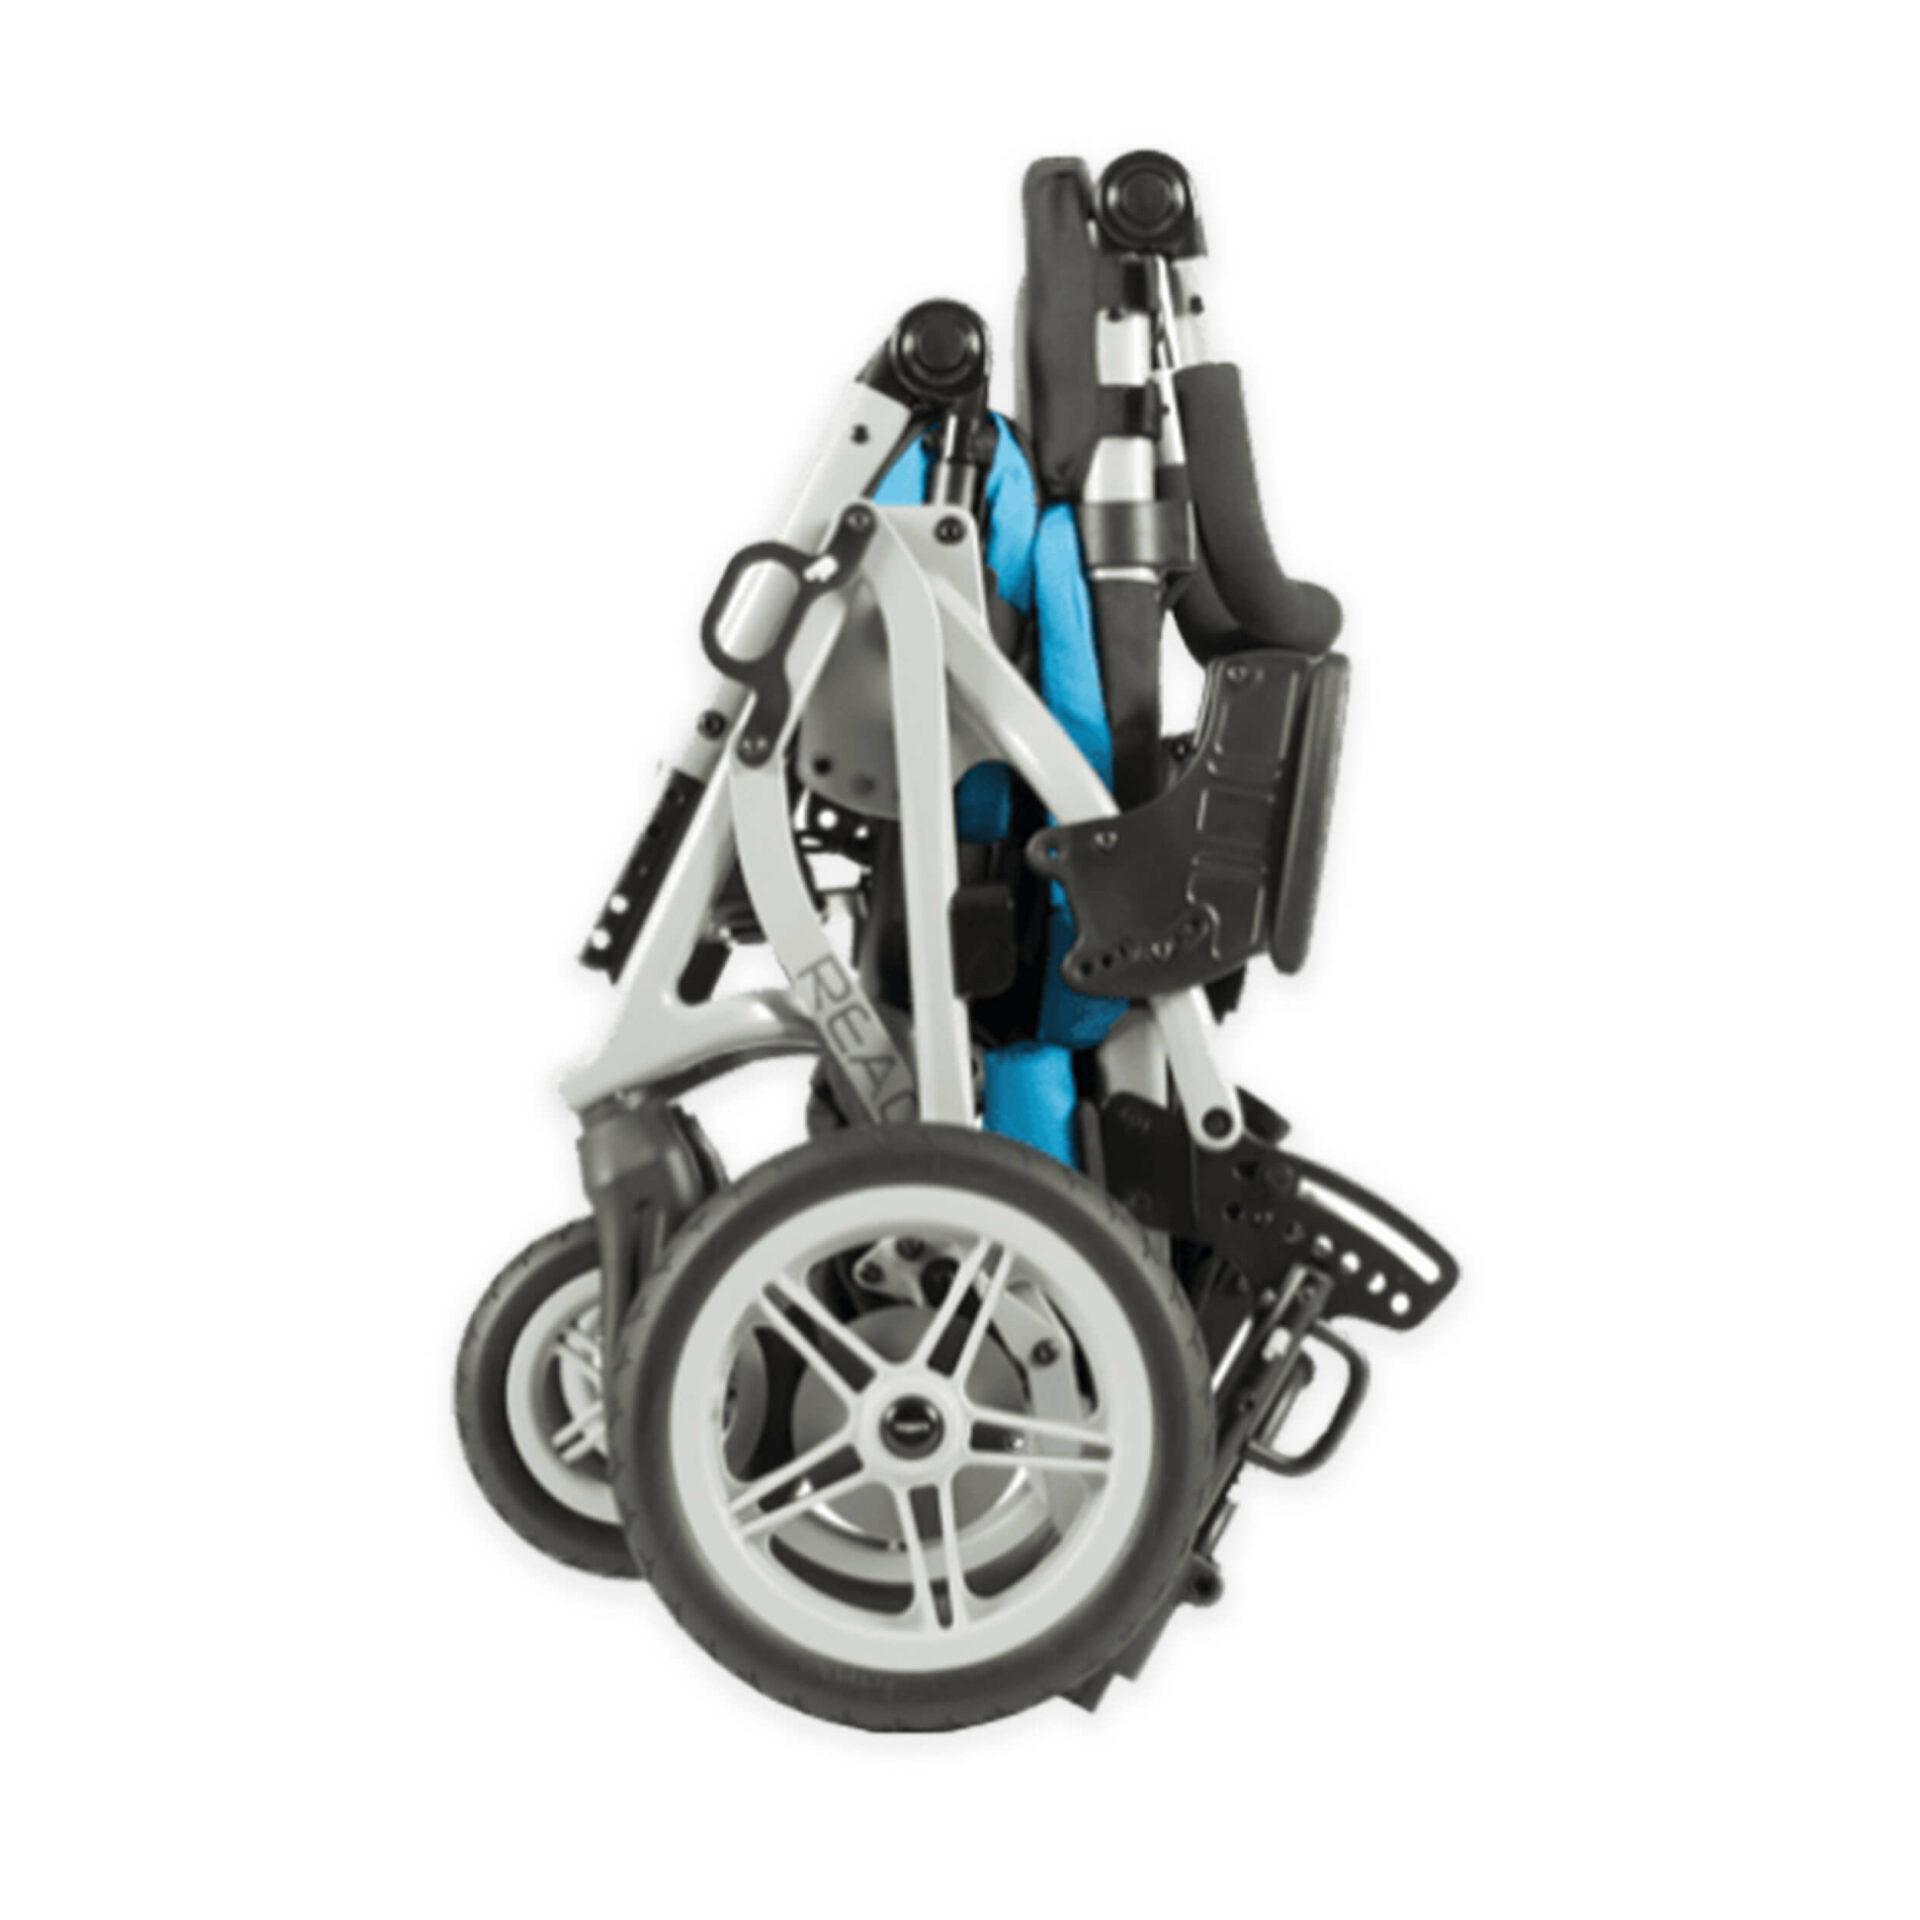 Folded Paediatric Reach Stroller